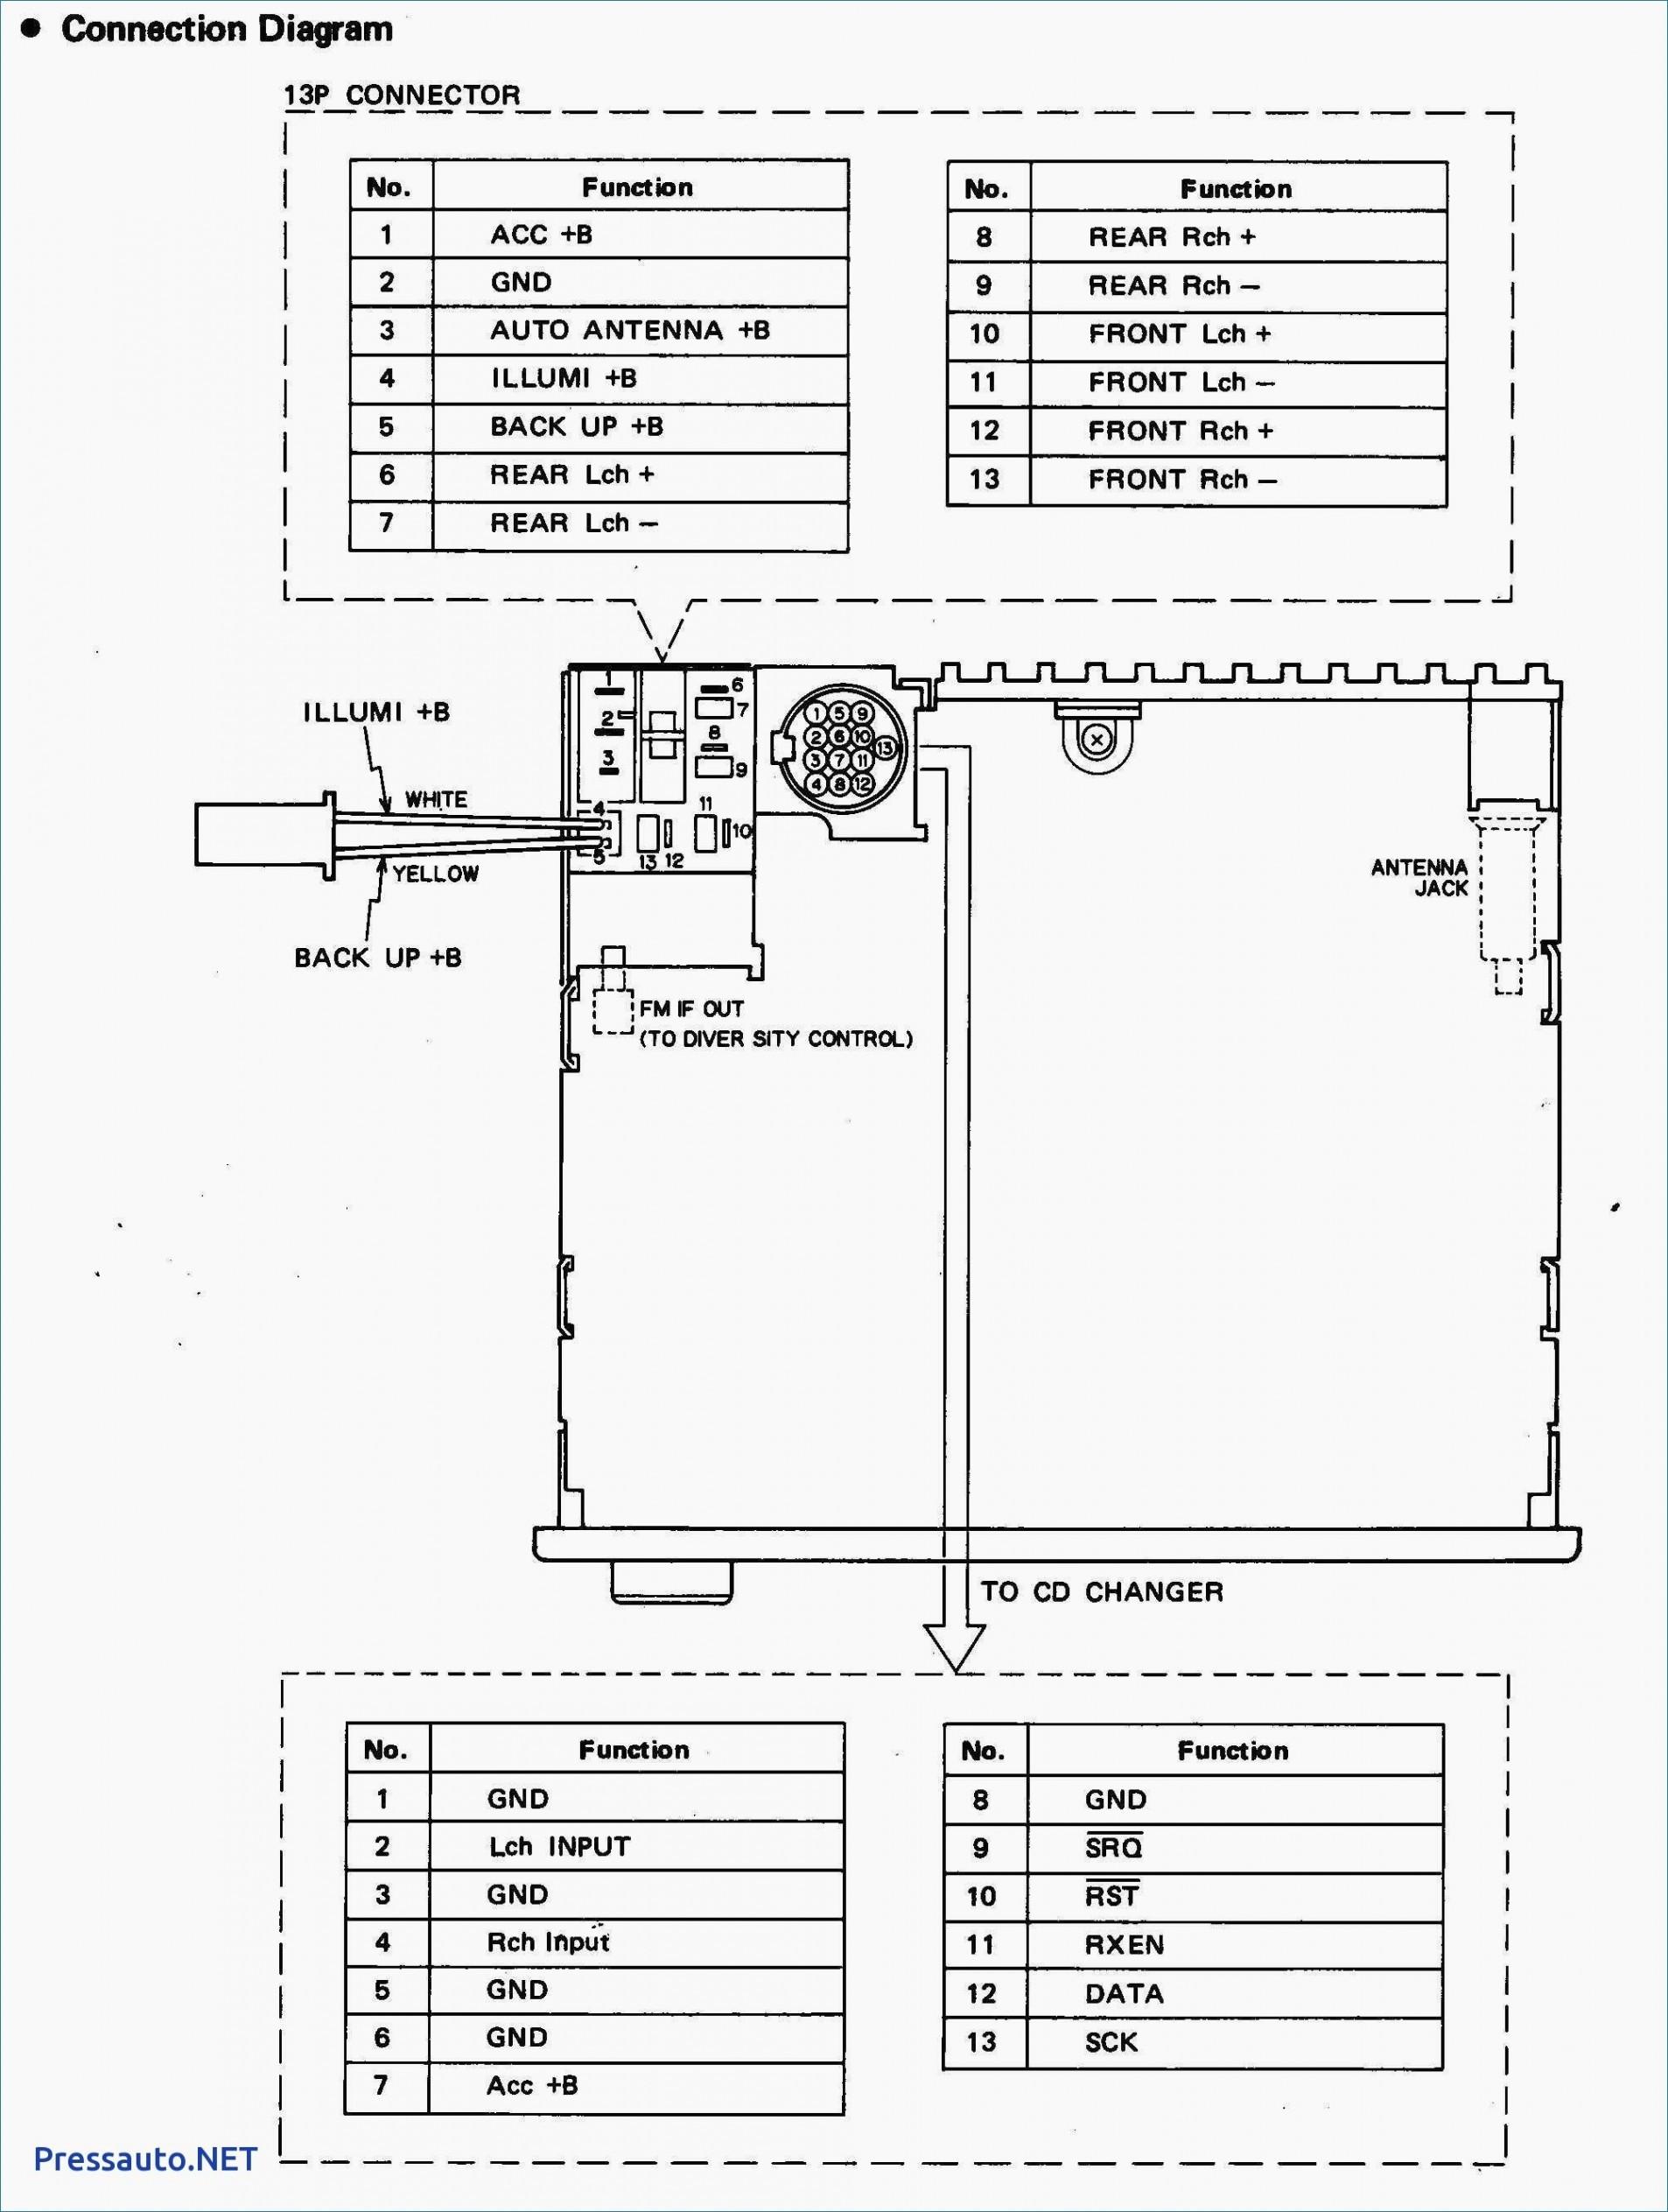 Factory Wiring Diagrams Car Audio Wiring Diagram Car Stereo Bookingritzcarltonfo Of Factory Wiring Diagrams Car Audio